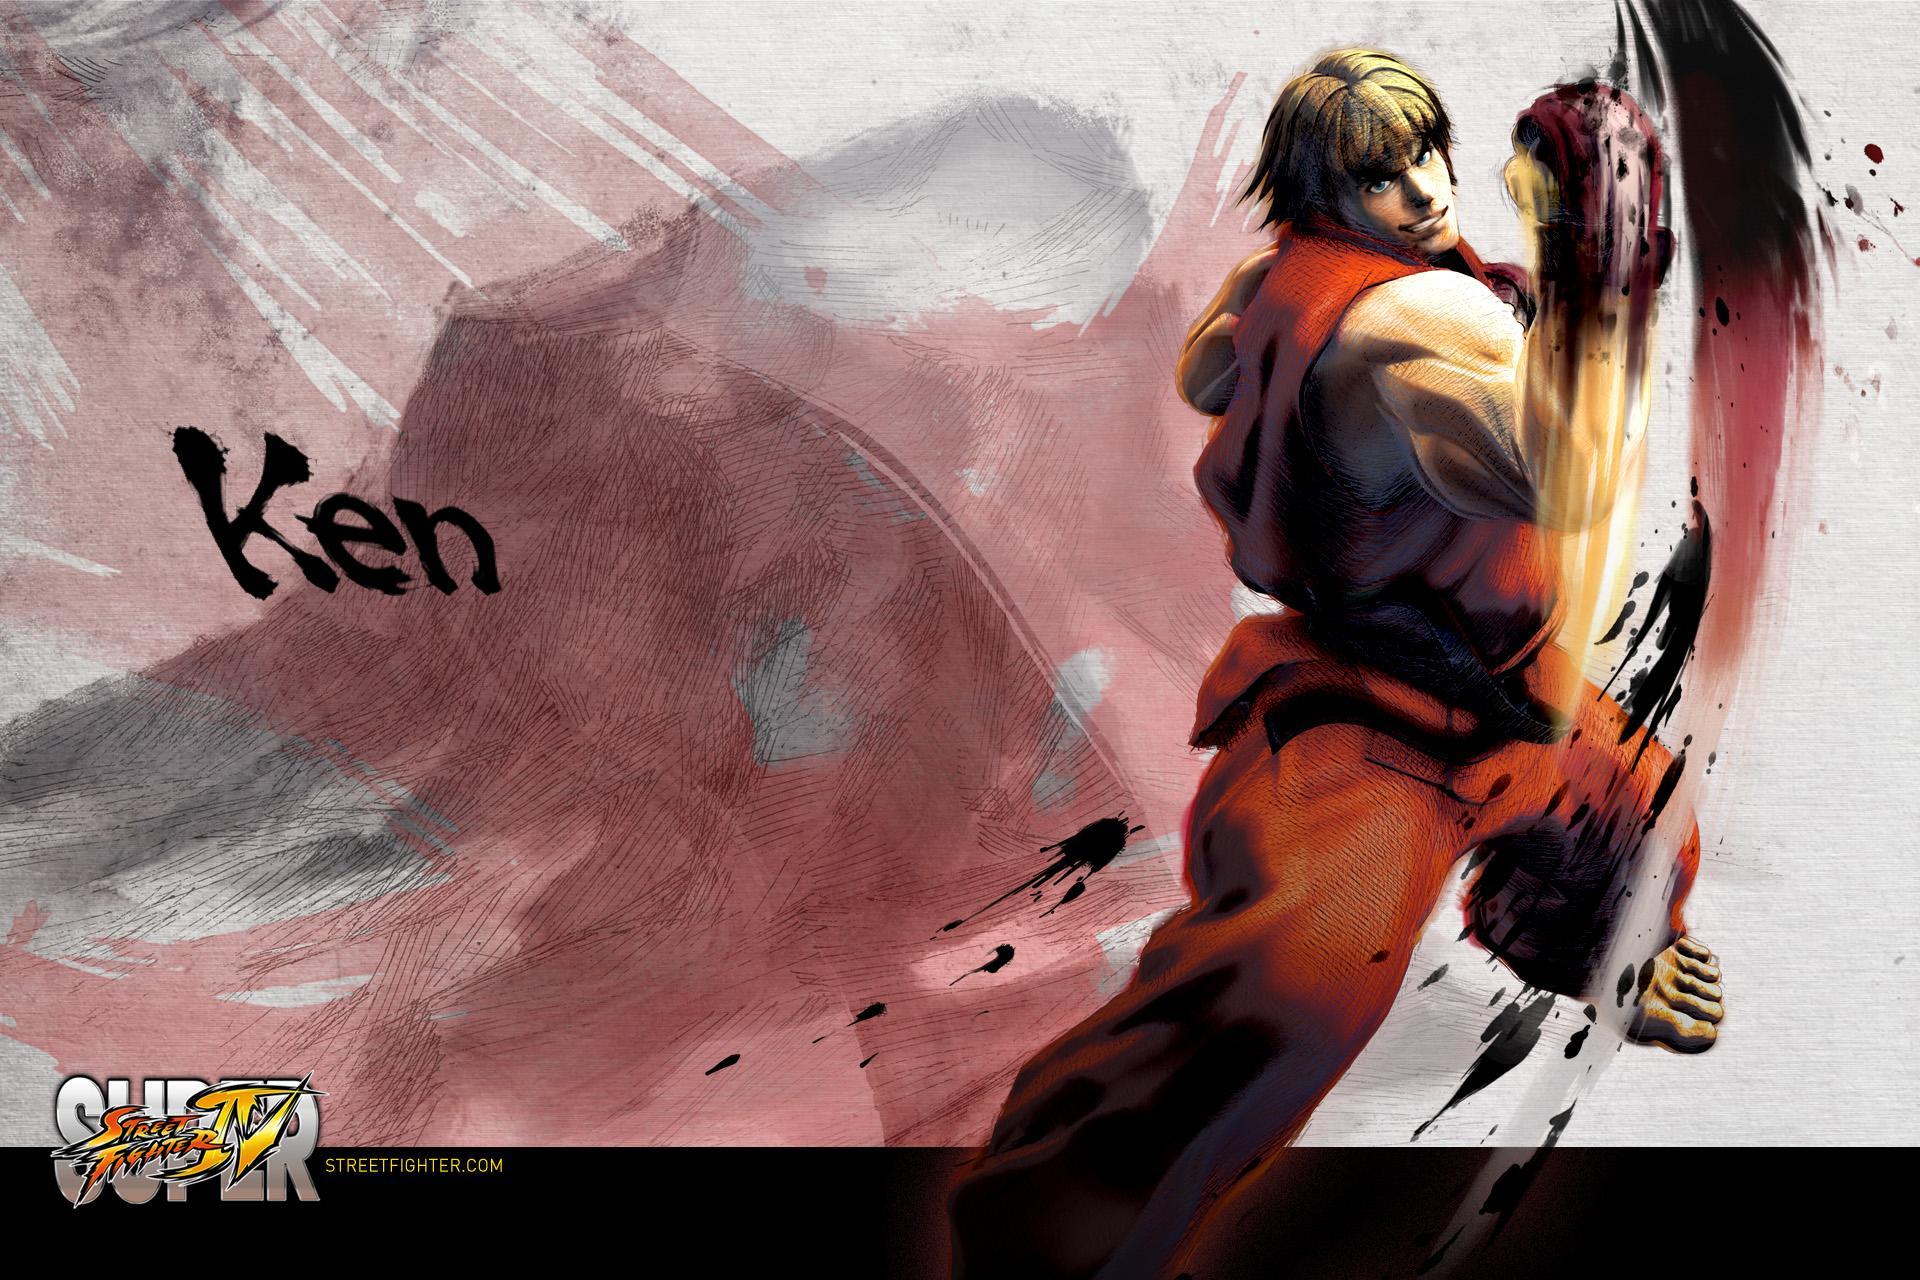 Street Fighter 4 Wallpapers: Super Street Fighter IV Wallpaper HD Download